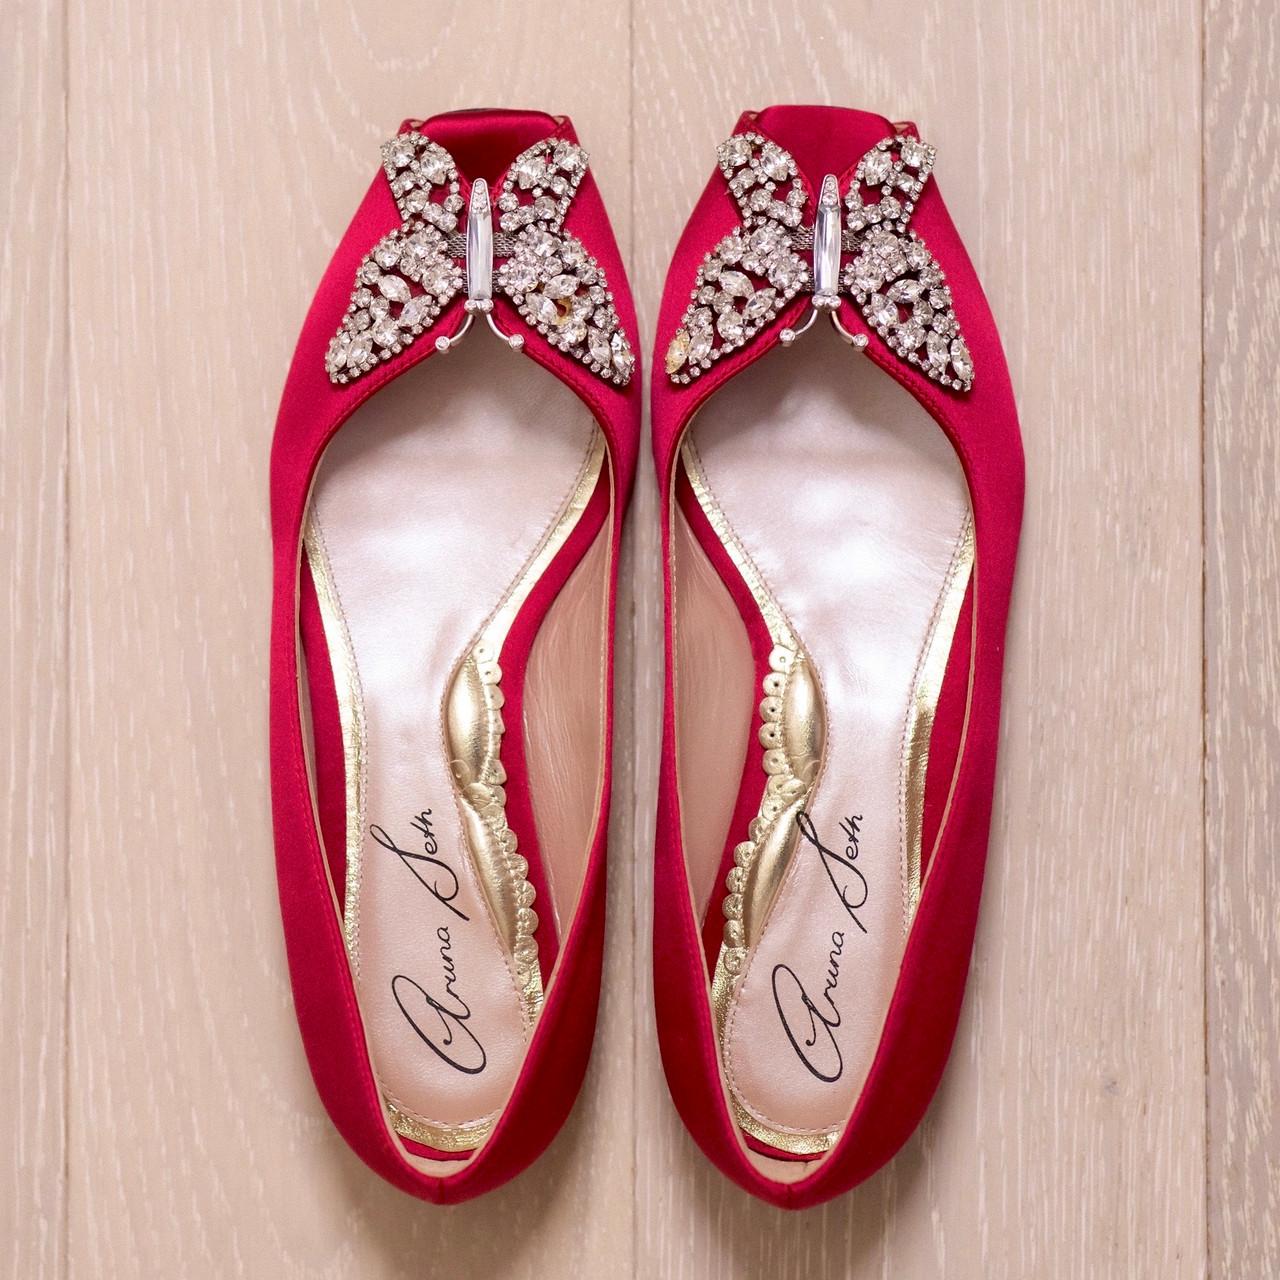 Liana Ballerina Cherry Red Satin